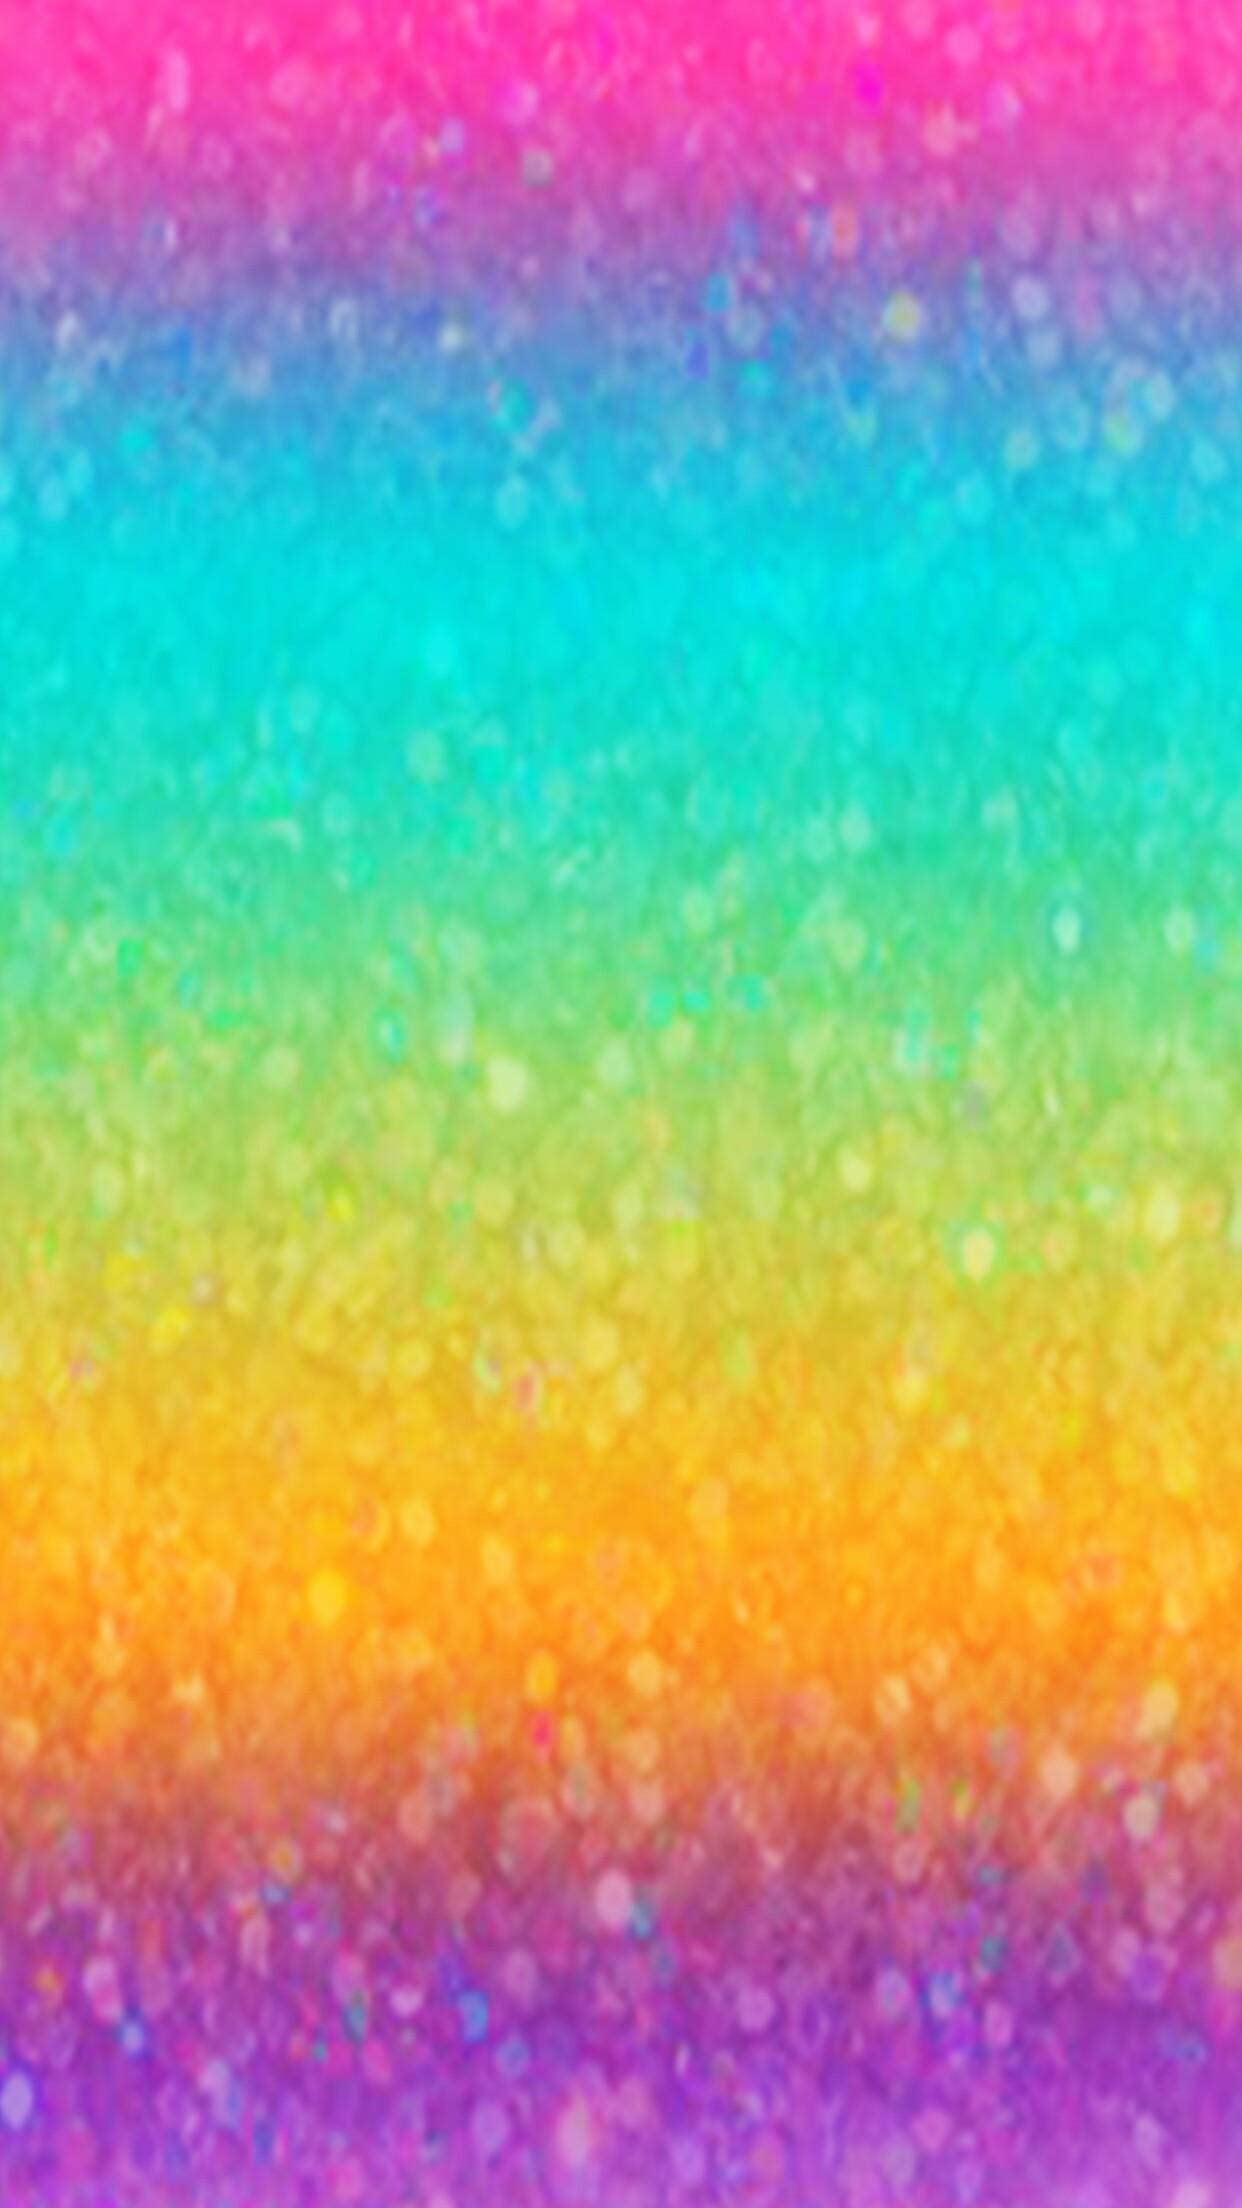 Wallpaper Blurry Iphone X Rainbow Stars Backgrounds 183 ① Wallpapertag